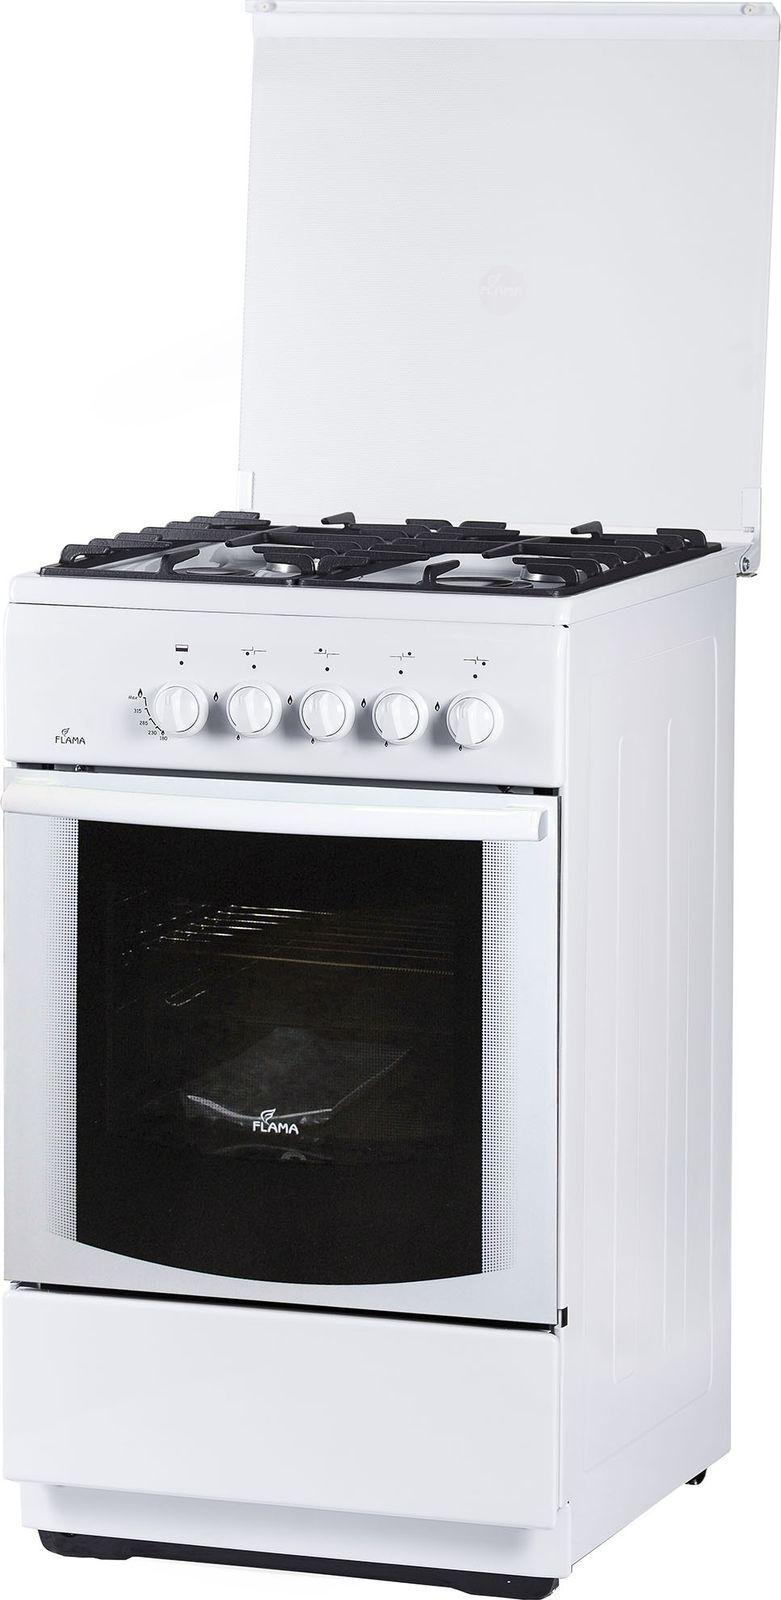 Кухонная плита Flama FG 24022 W, белый